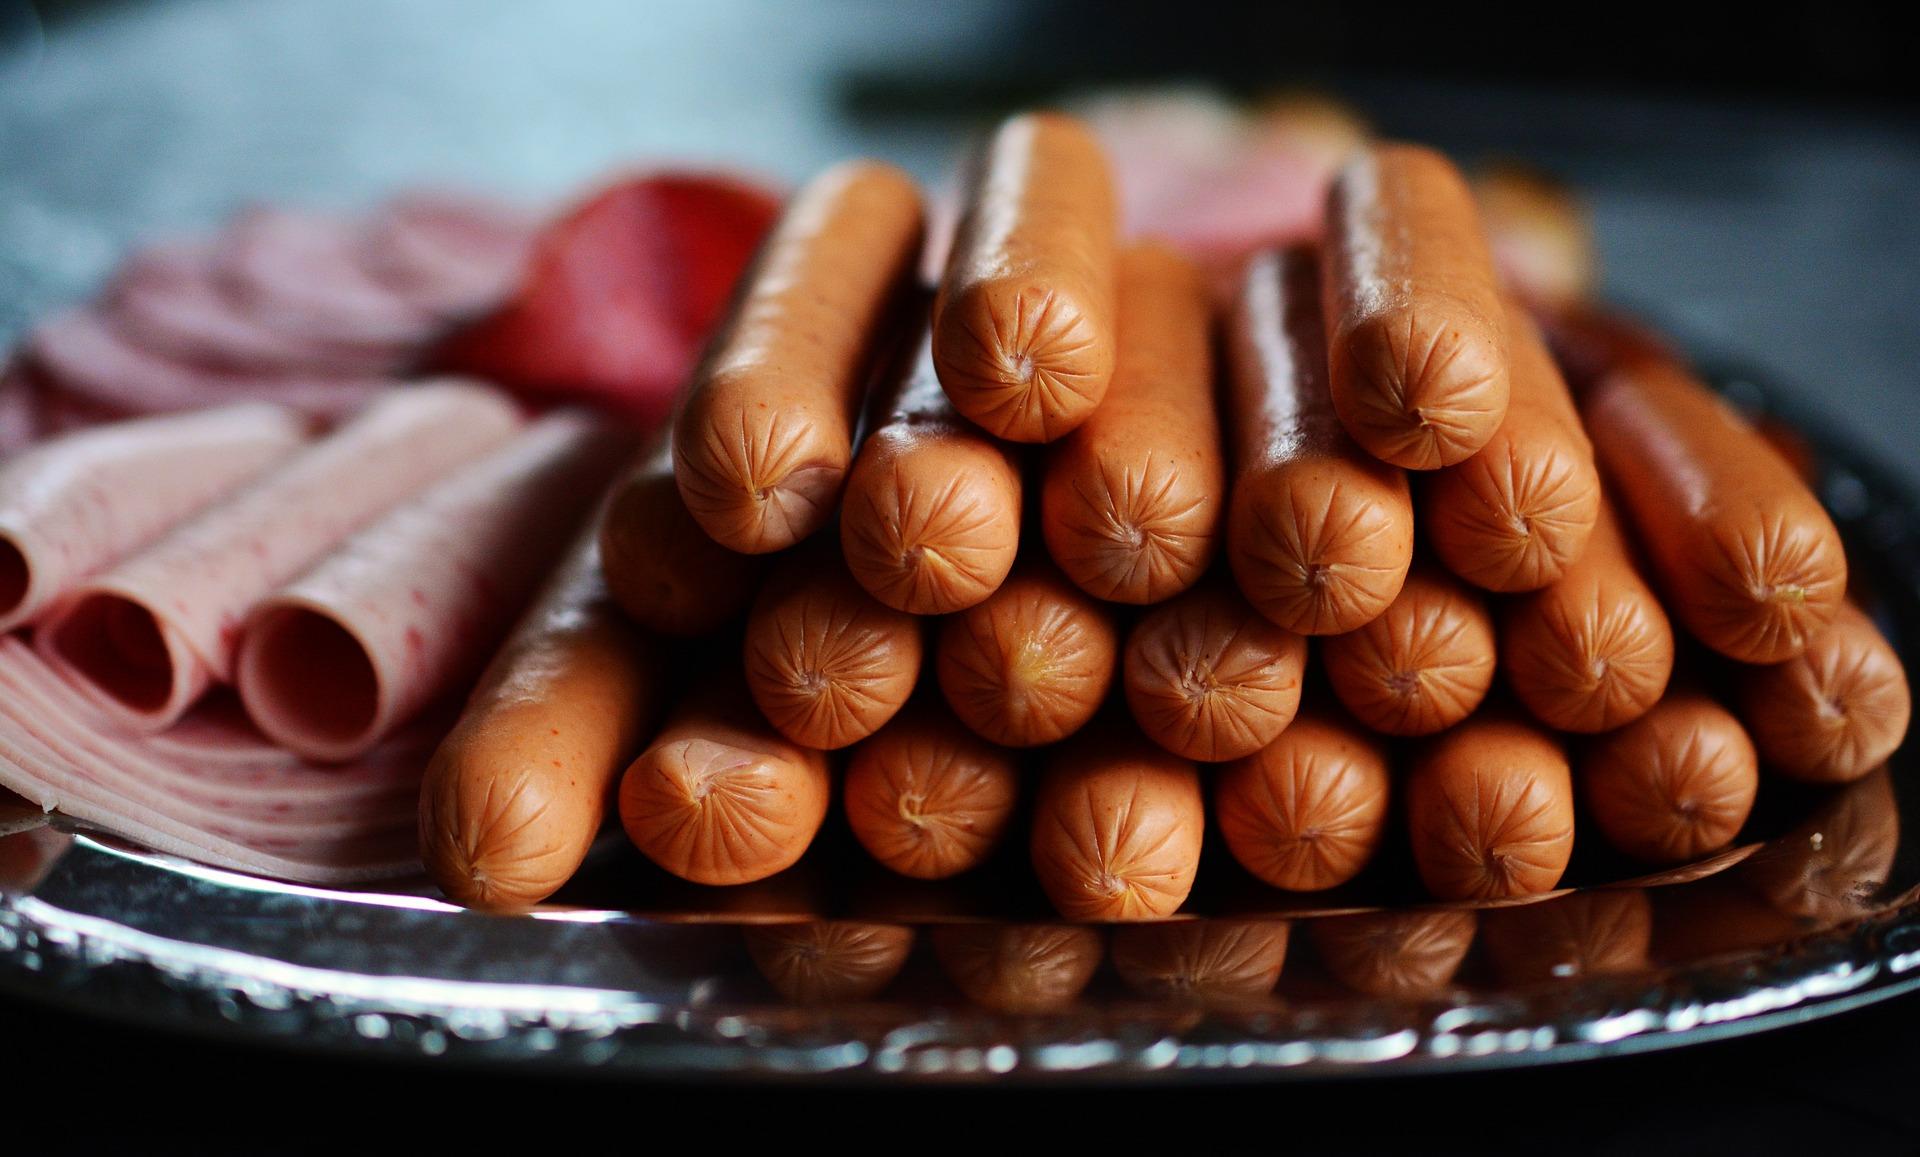 Alimentos procesados con glutamato monosódico